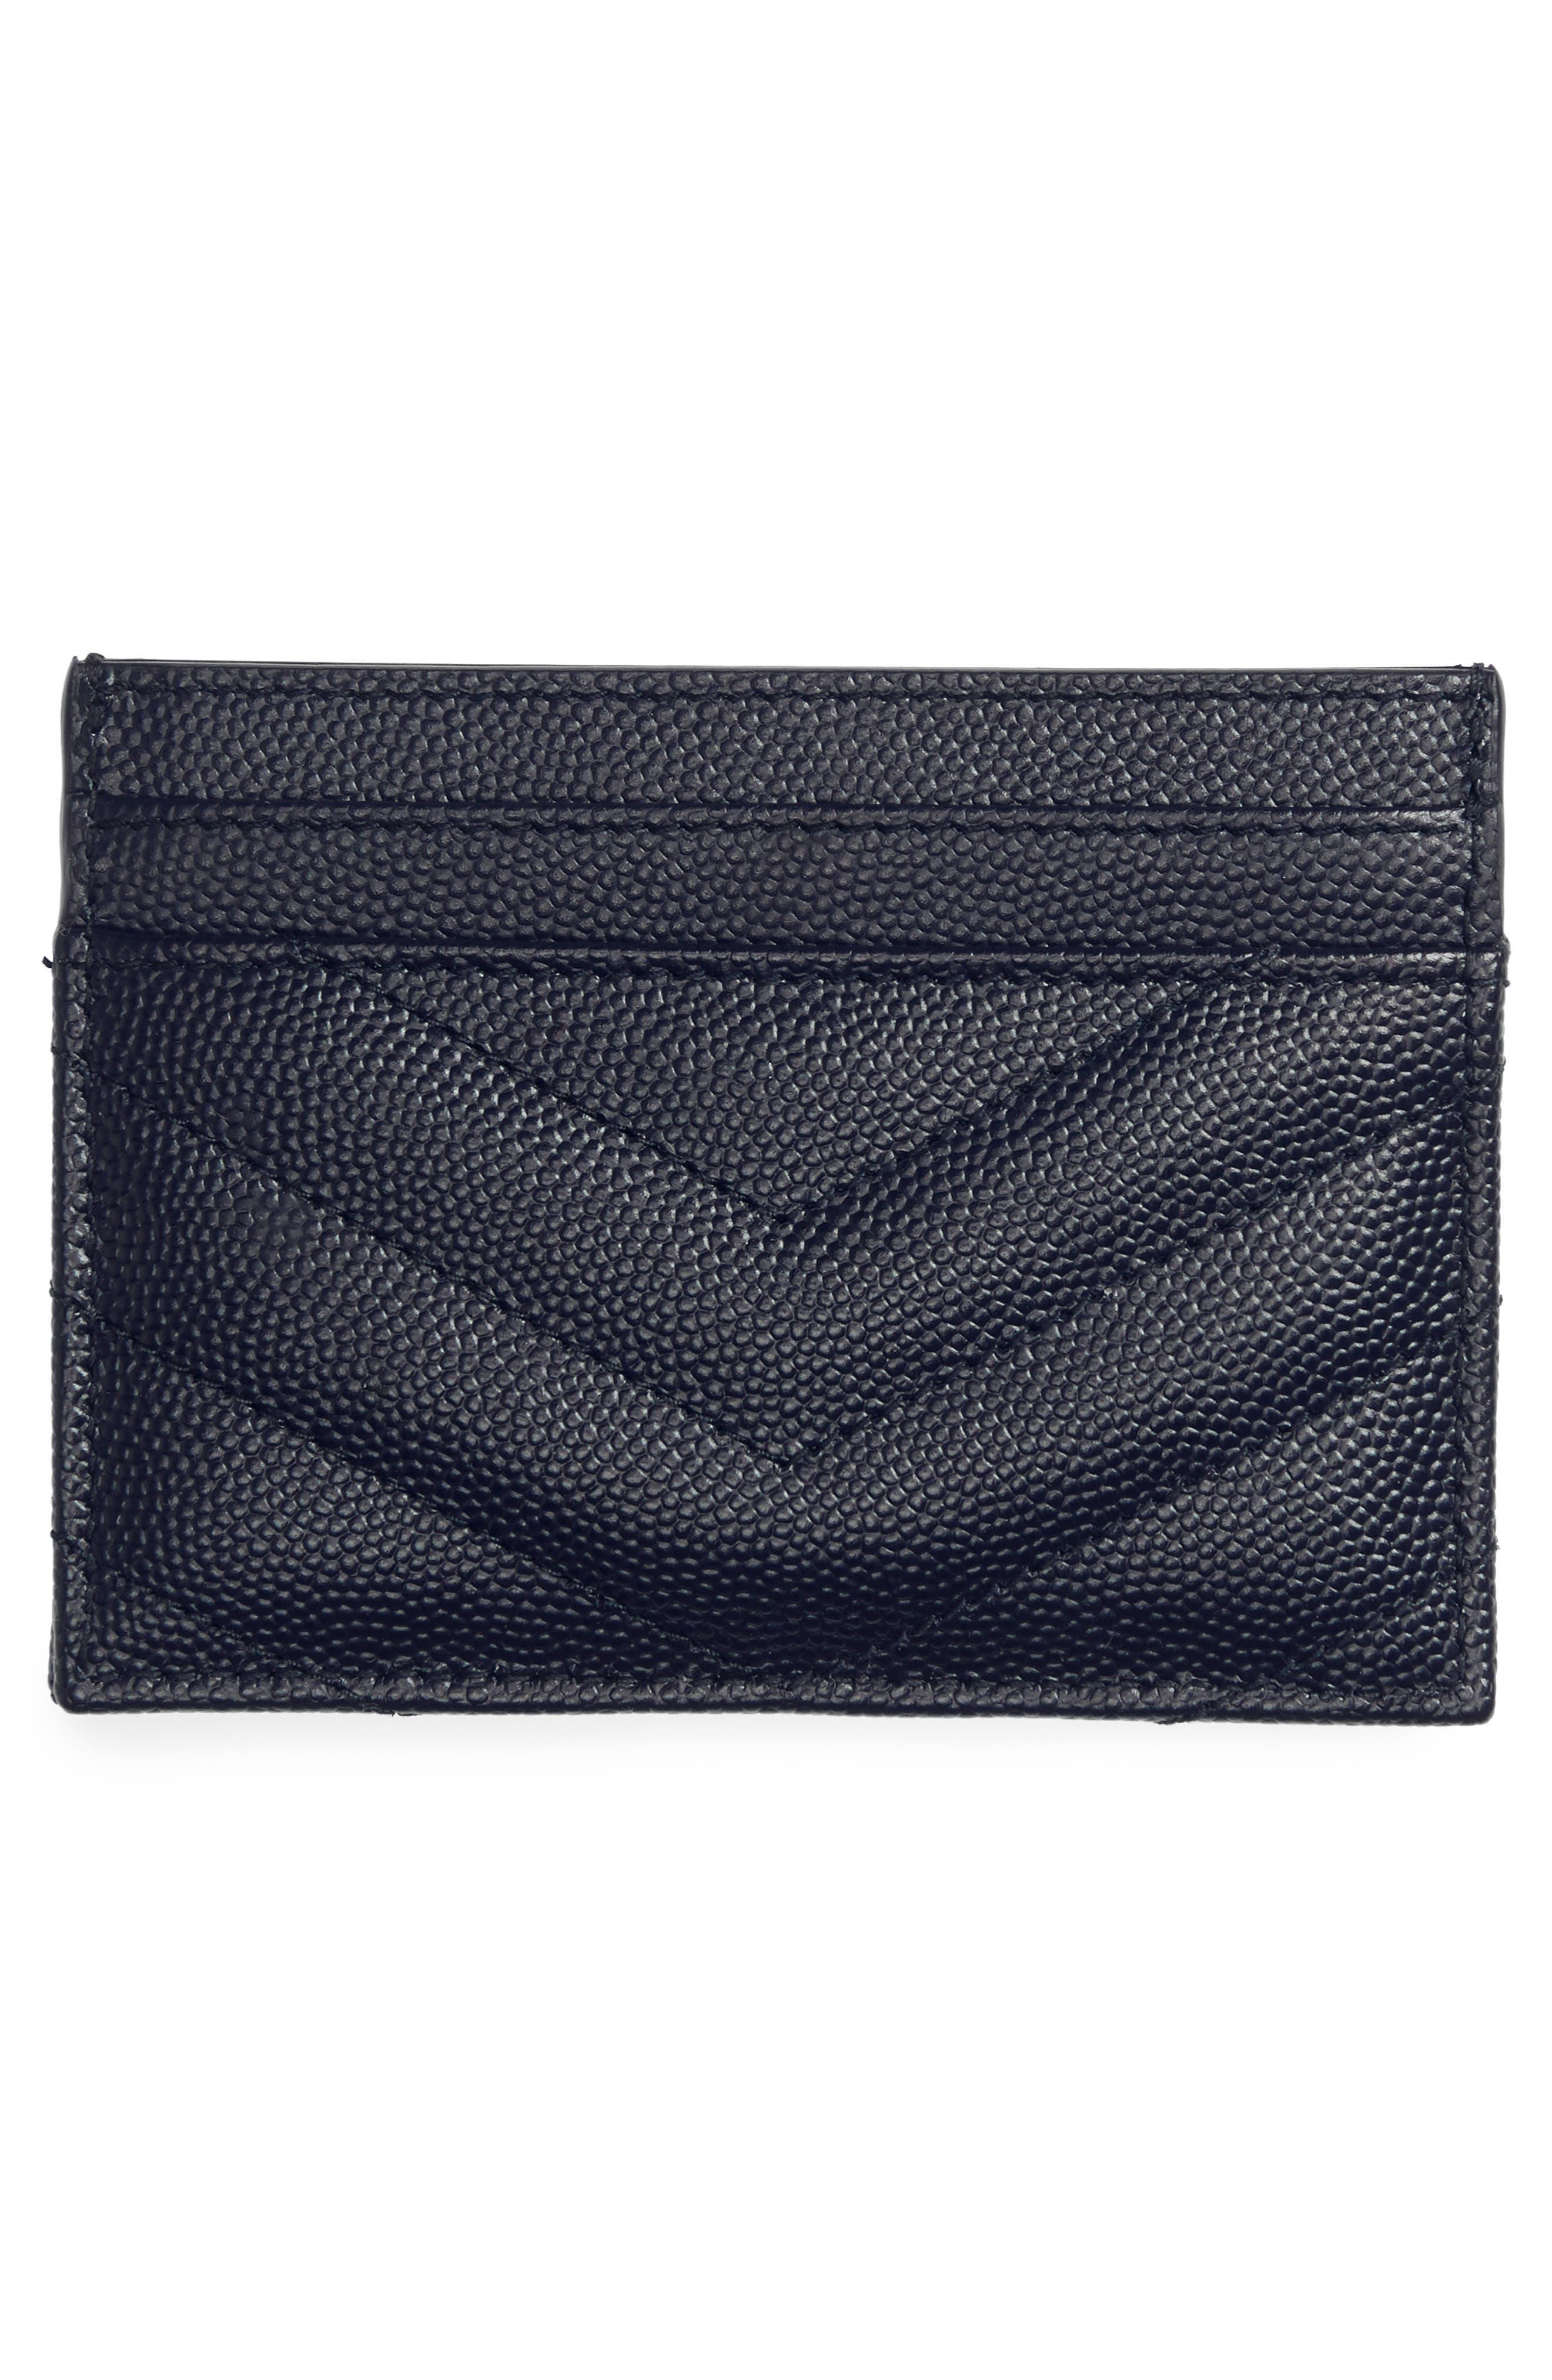 'Monogram' Credit Card Case,                             Alternate thumbnail 2, color,                             Blue